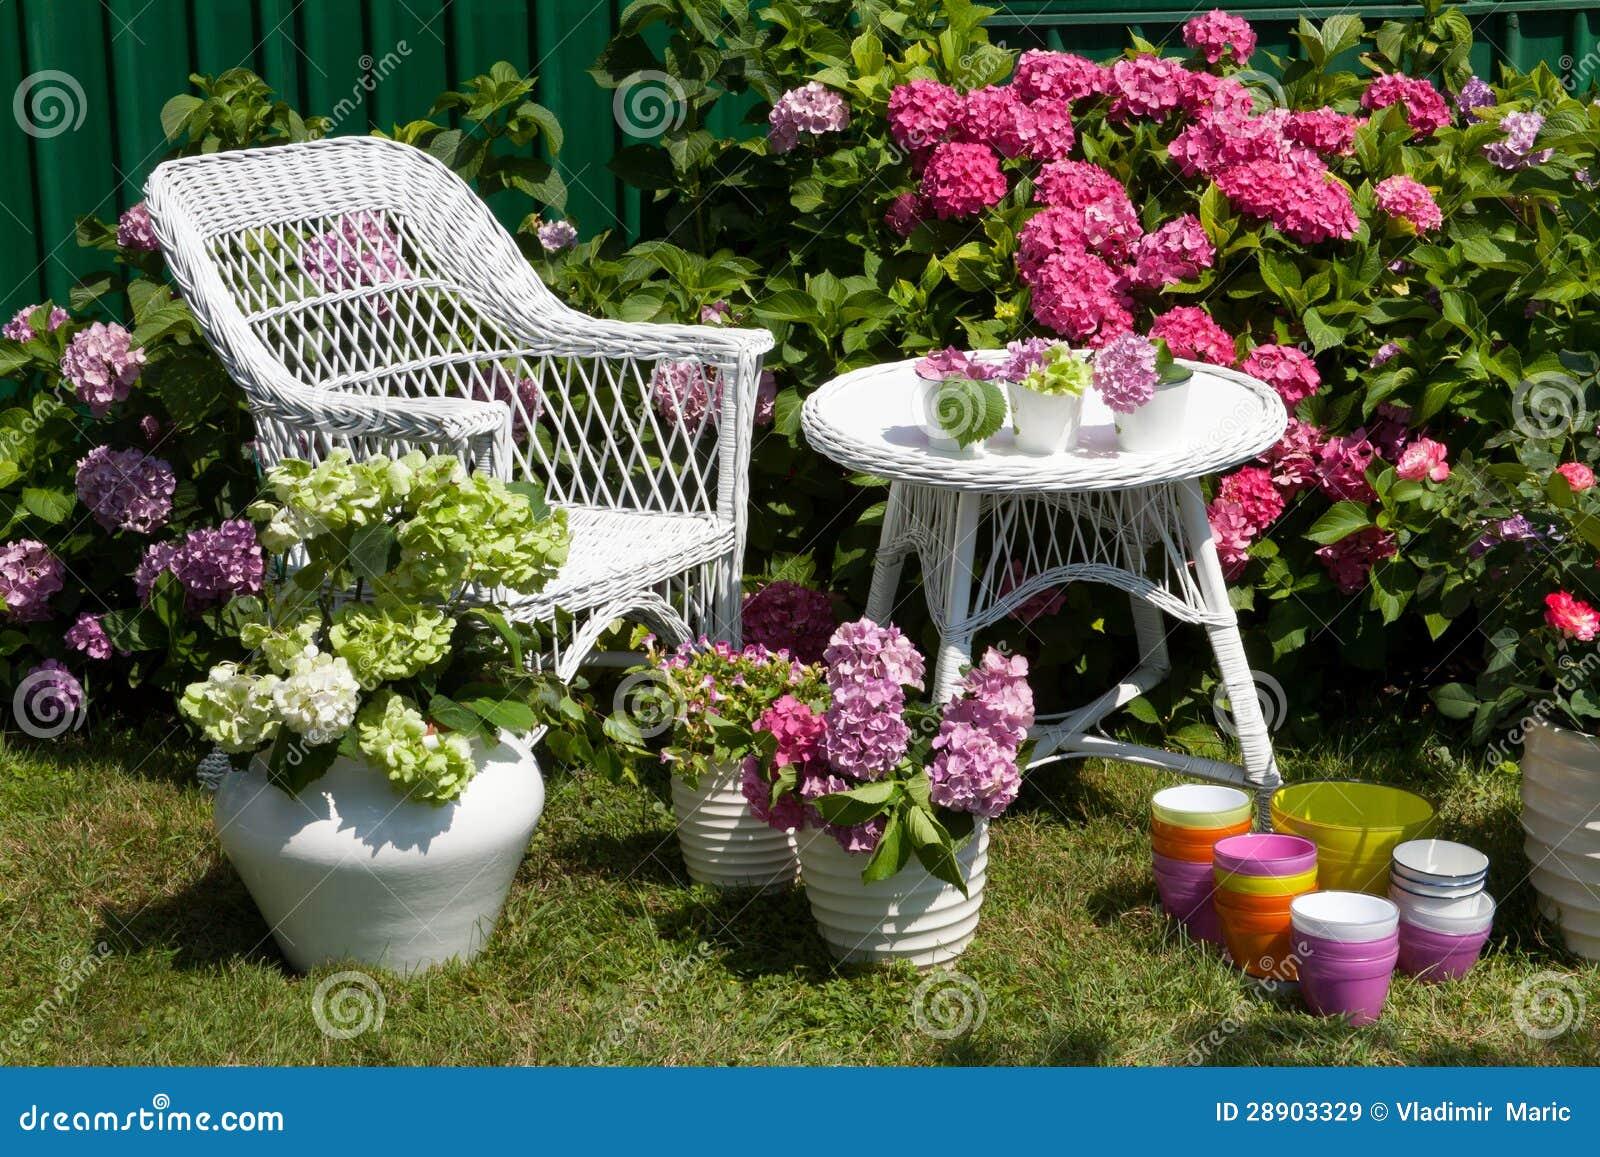 jardin d 39 hortensia images libres de droits image 28903329. Black Bedroom Furniture Sets. Home Design Ideas